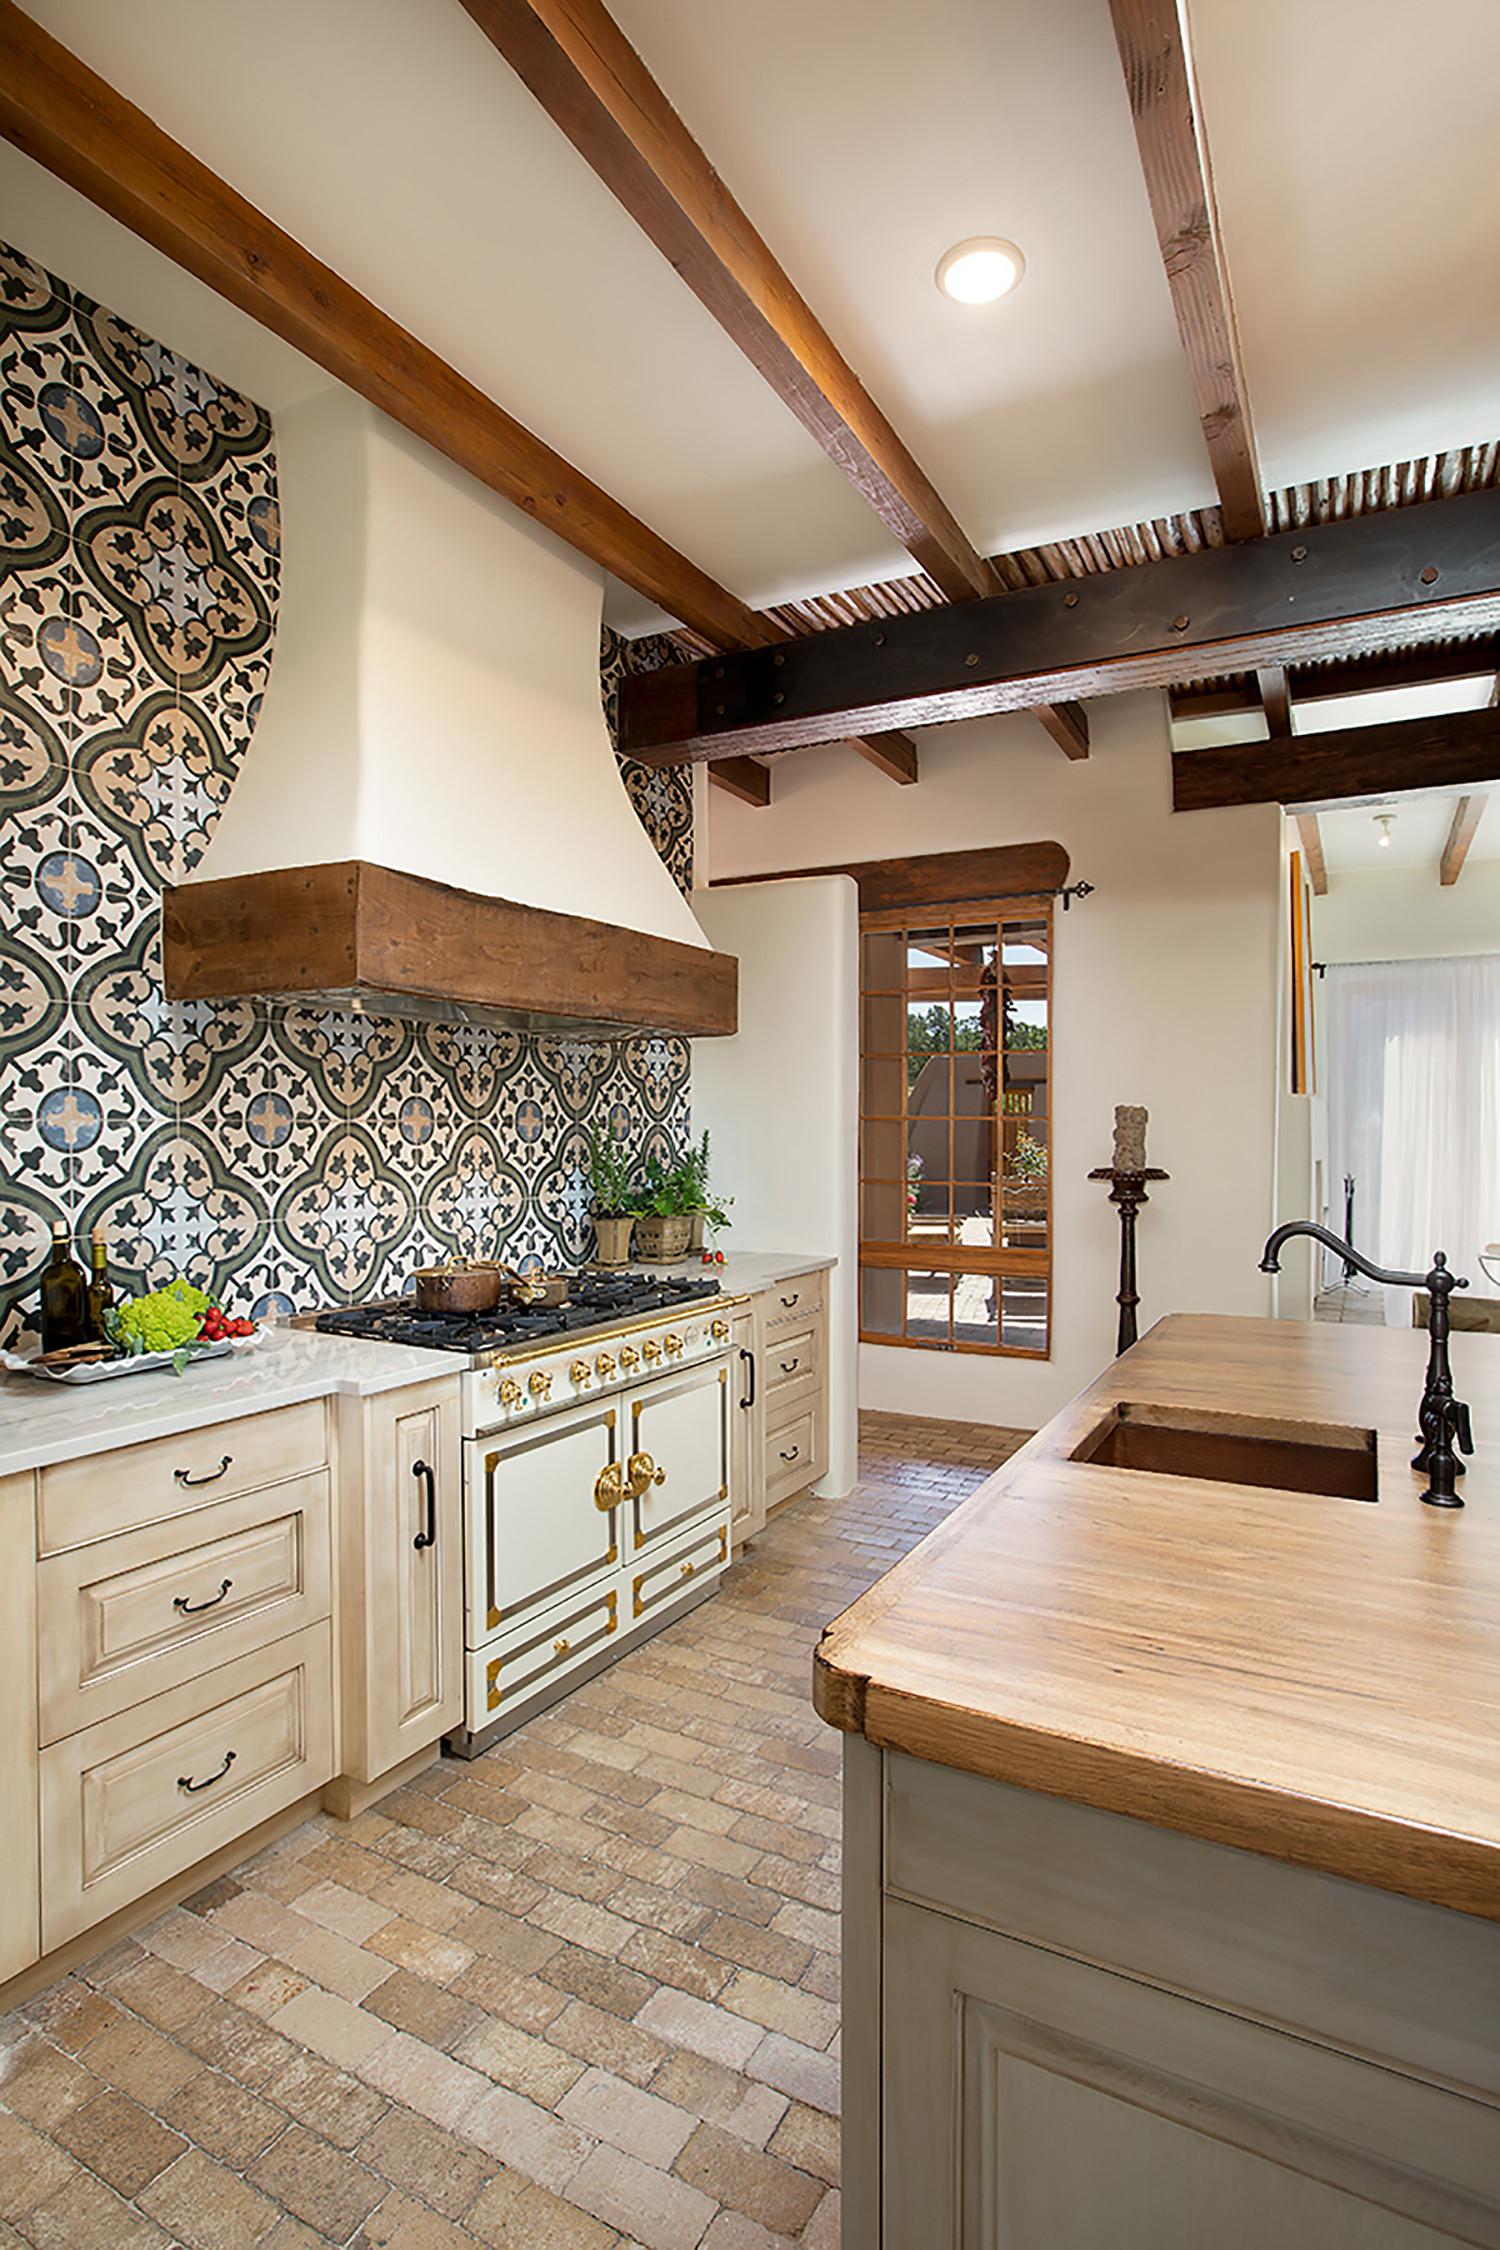 santa-fe-new-mexico-kitchen-breakfast-nook-interior-design-montgomery-home-3.jpg